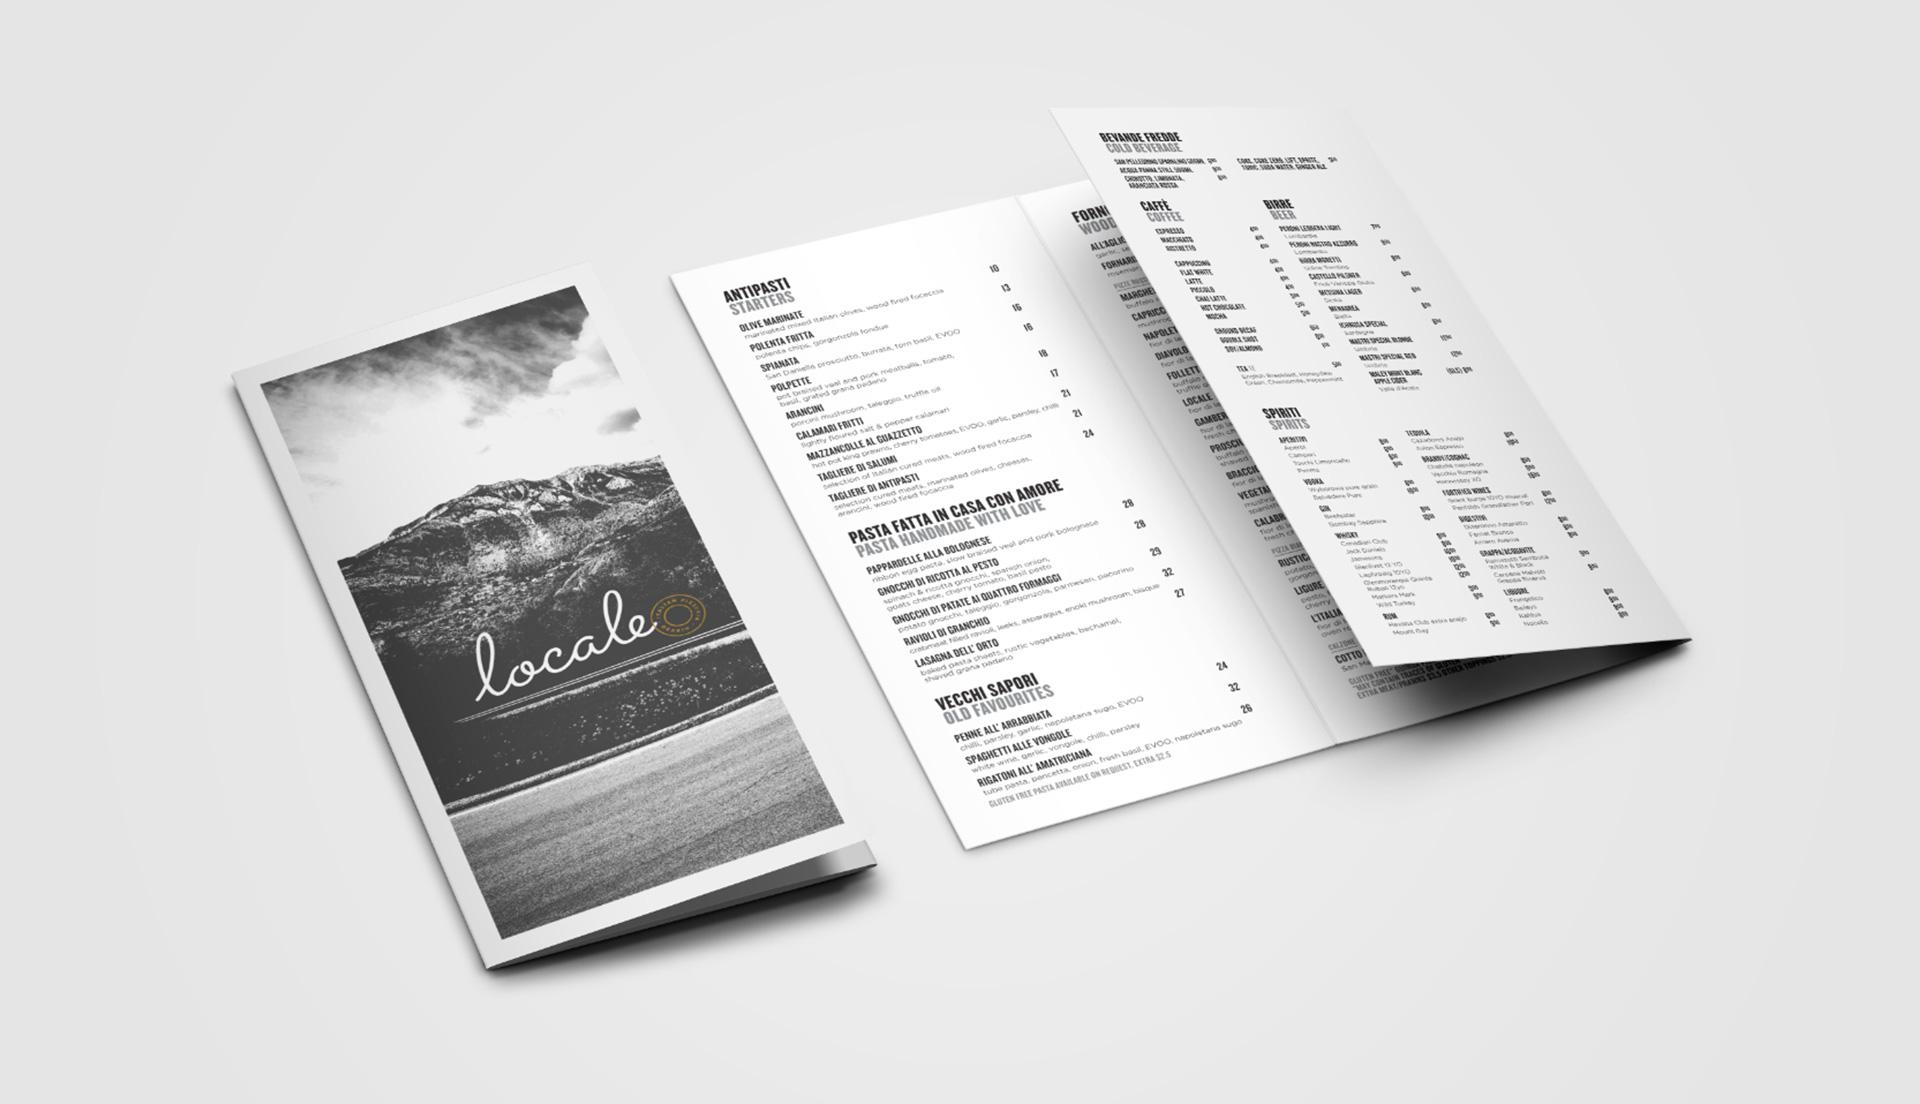 IKL-WEB_2014_1920-Content-Locale_16